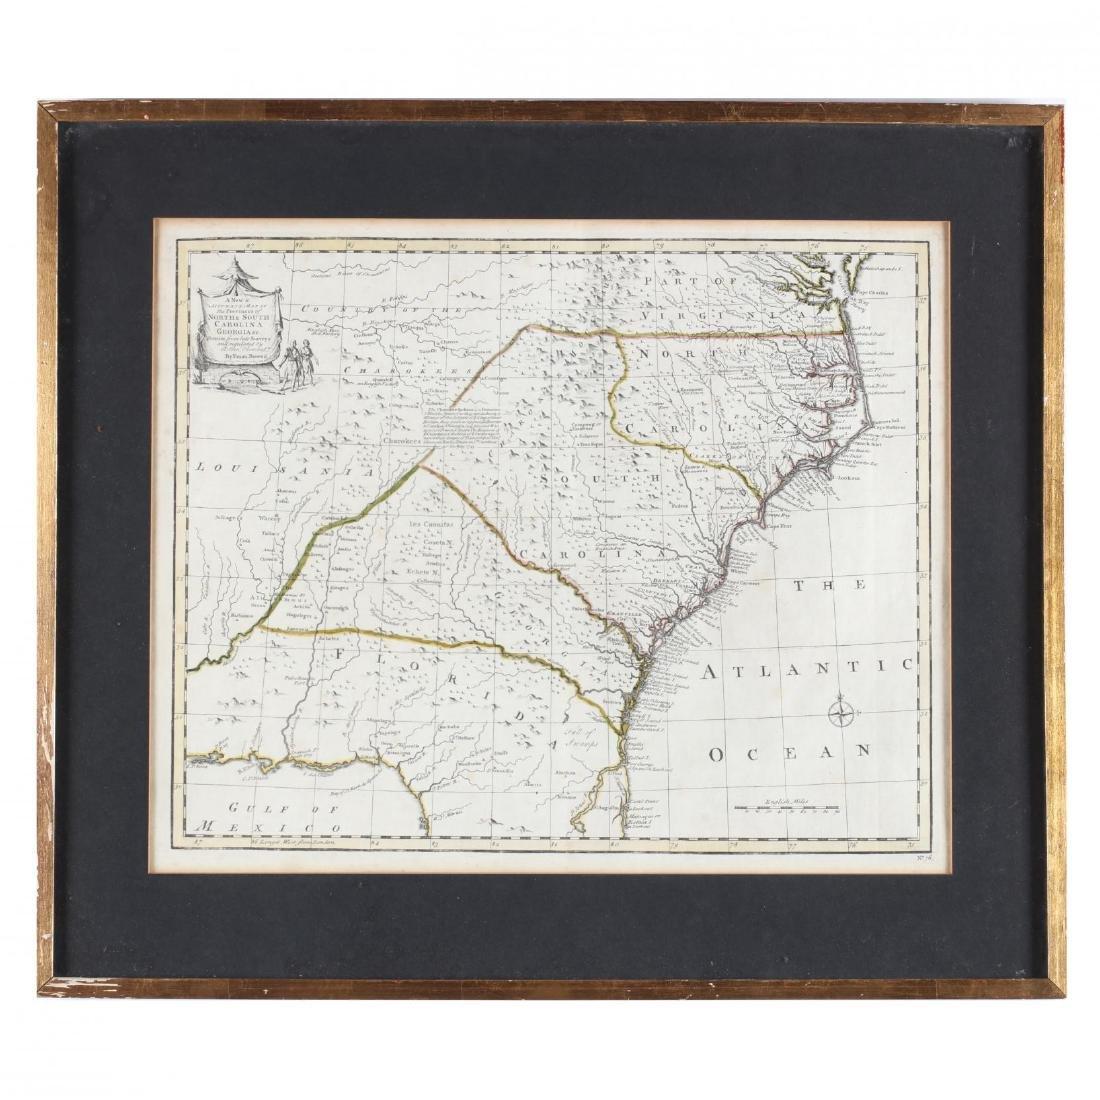 Two Emanuel Bowen Maps Showing the East Coast - 5